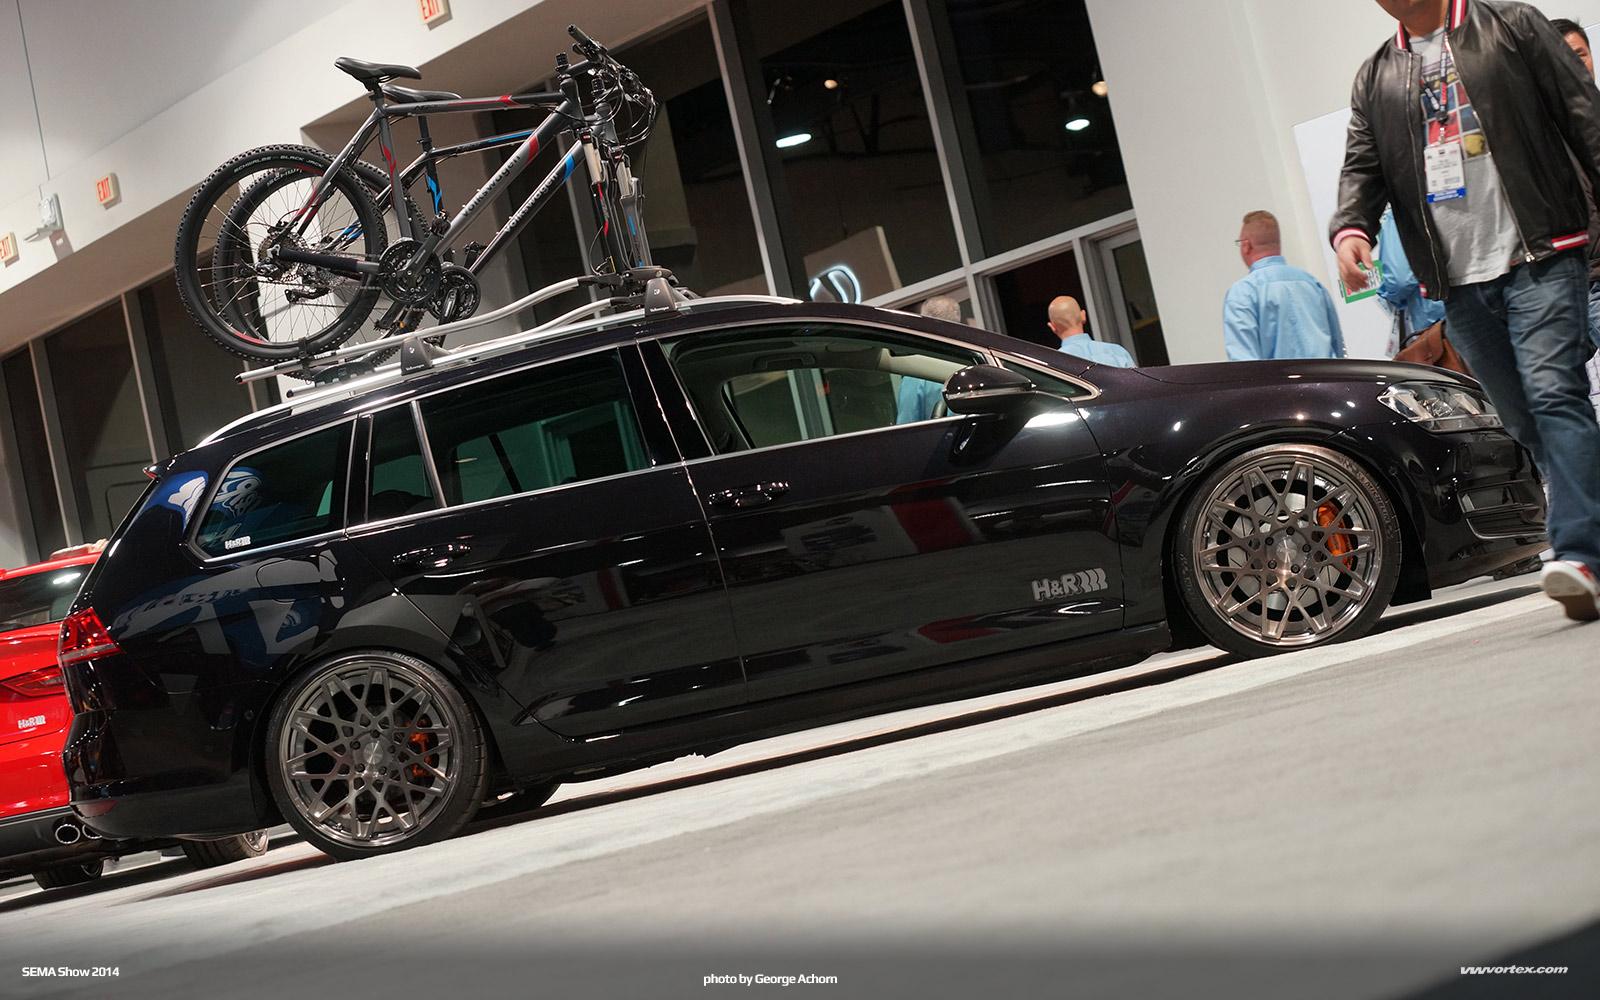 2014-SEMA-Show-VW-1162